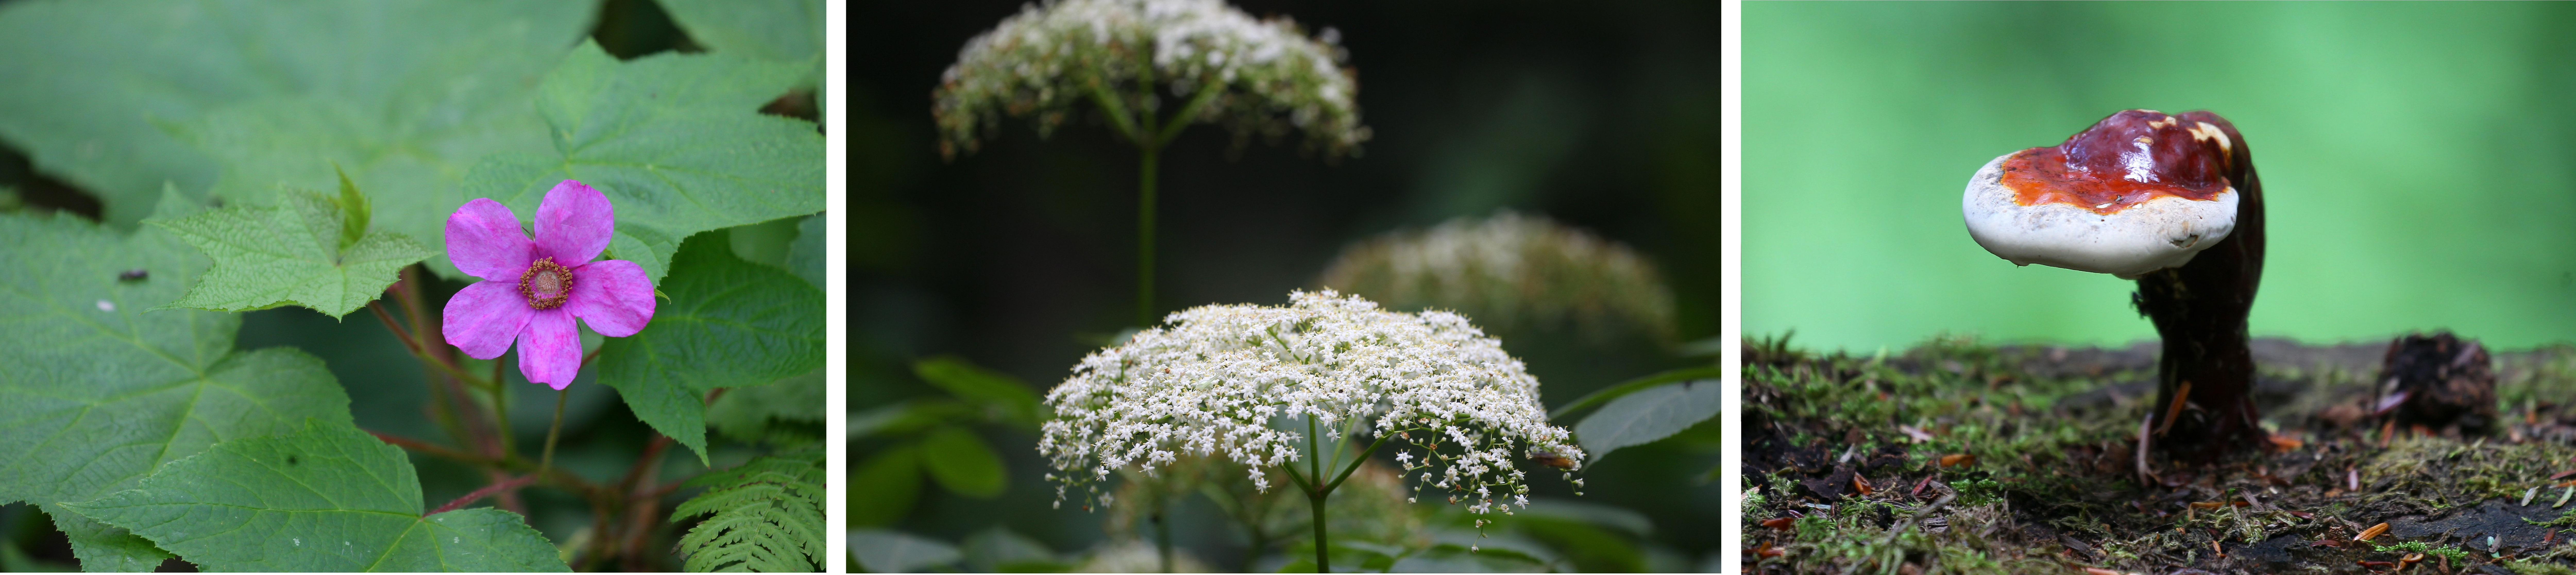 Flowers and fungus dot the Jackson Falls property. (Mark Mulville/Buffalo News)